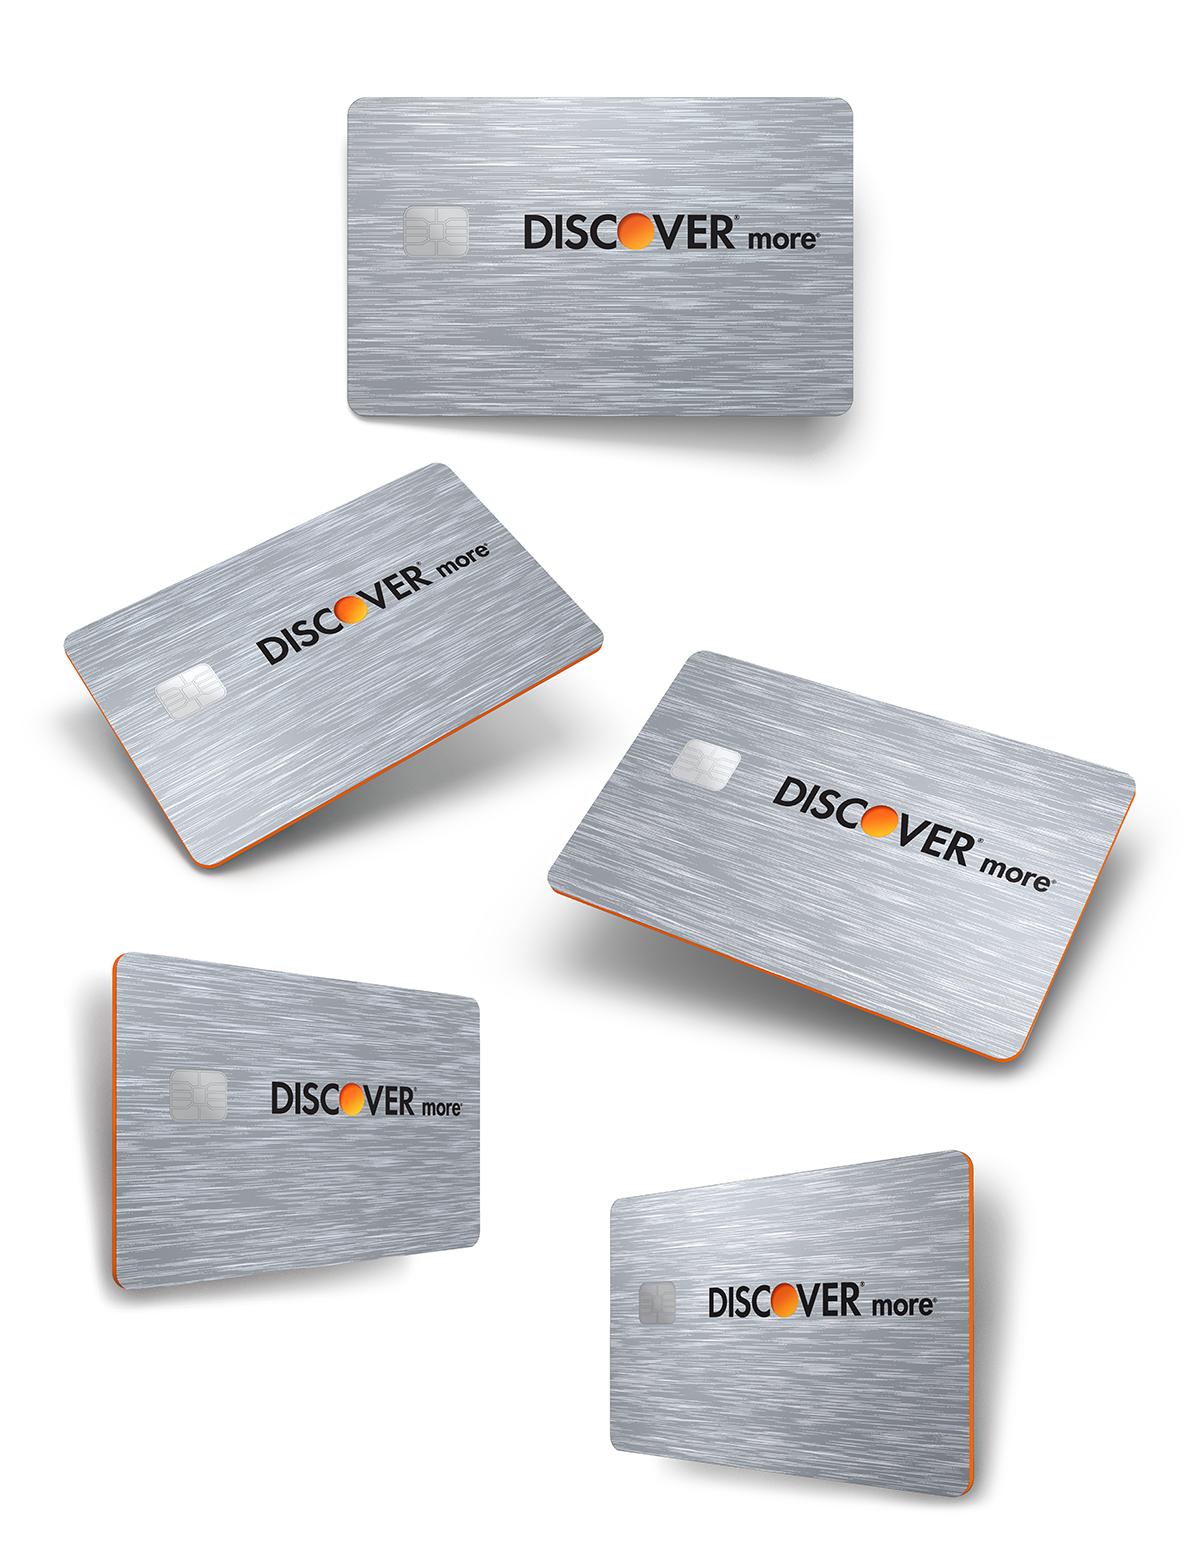 Discover Card Art & Design on Behance